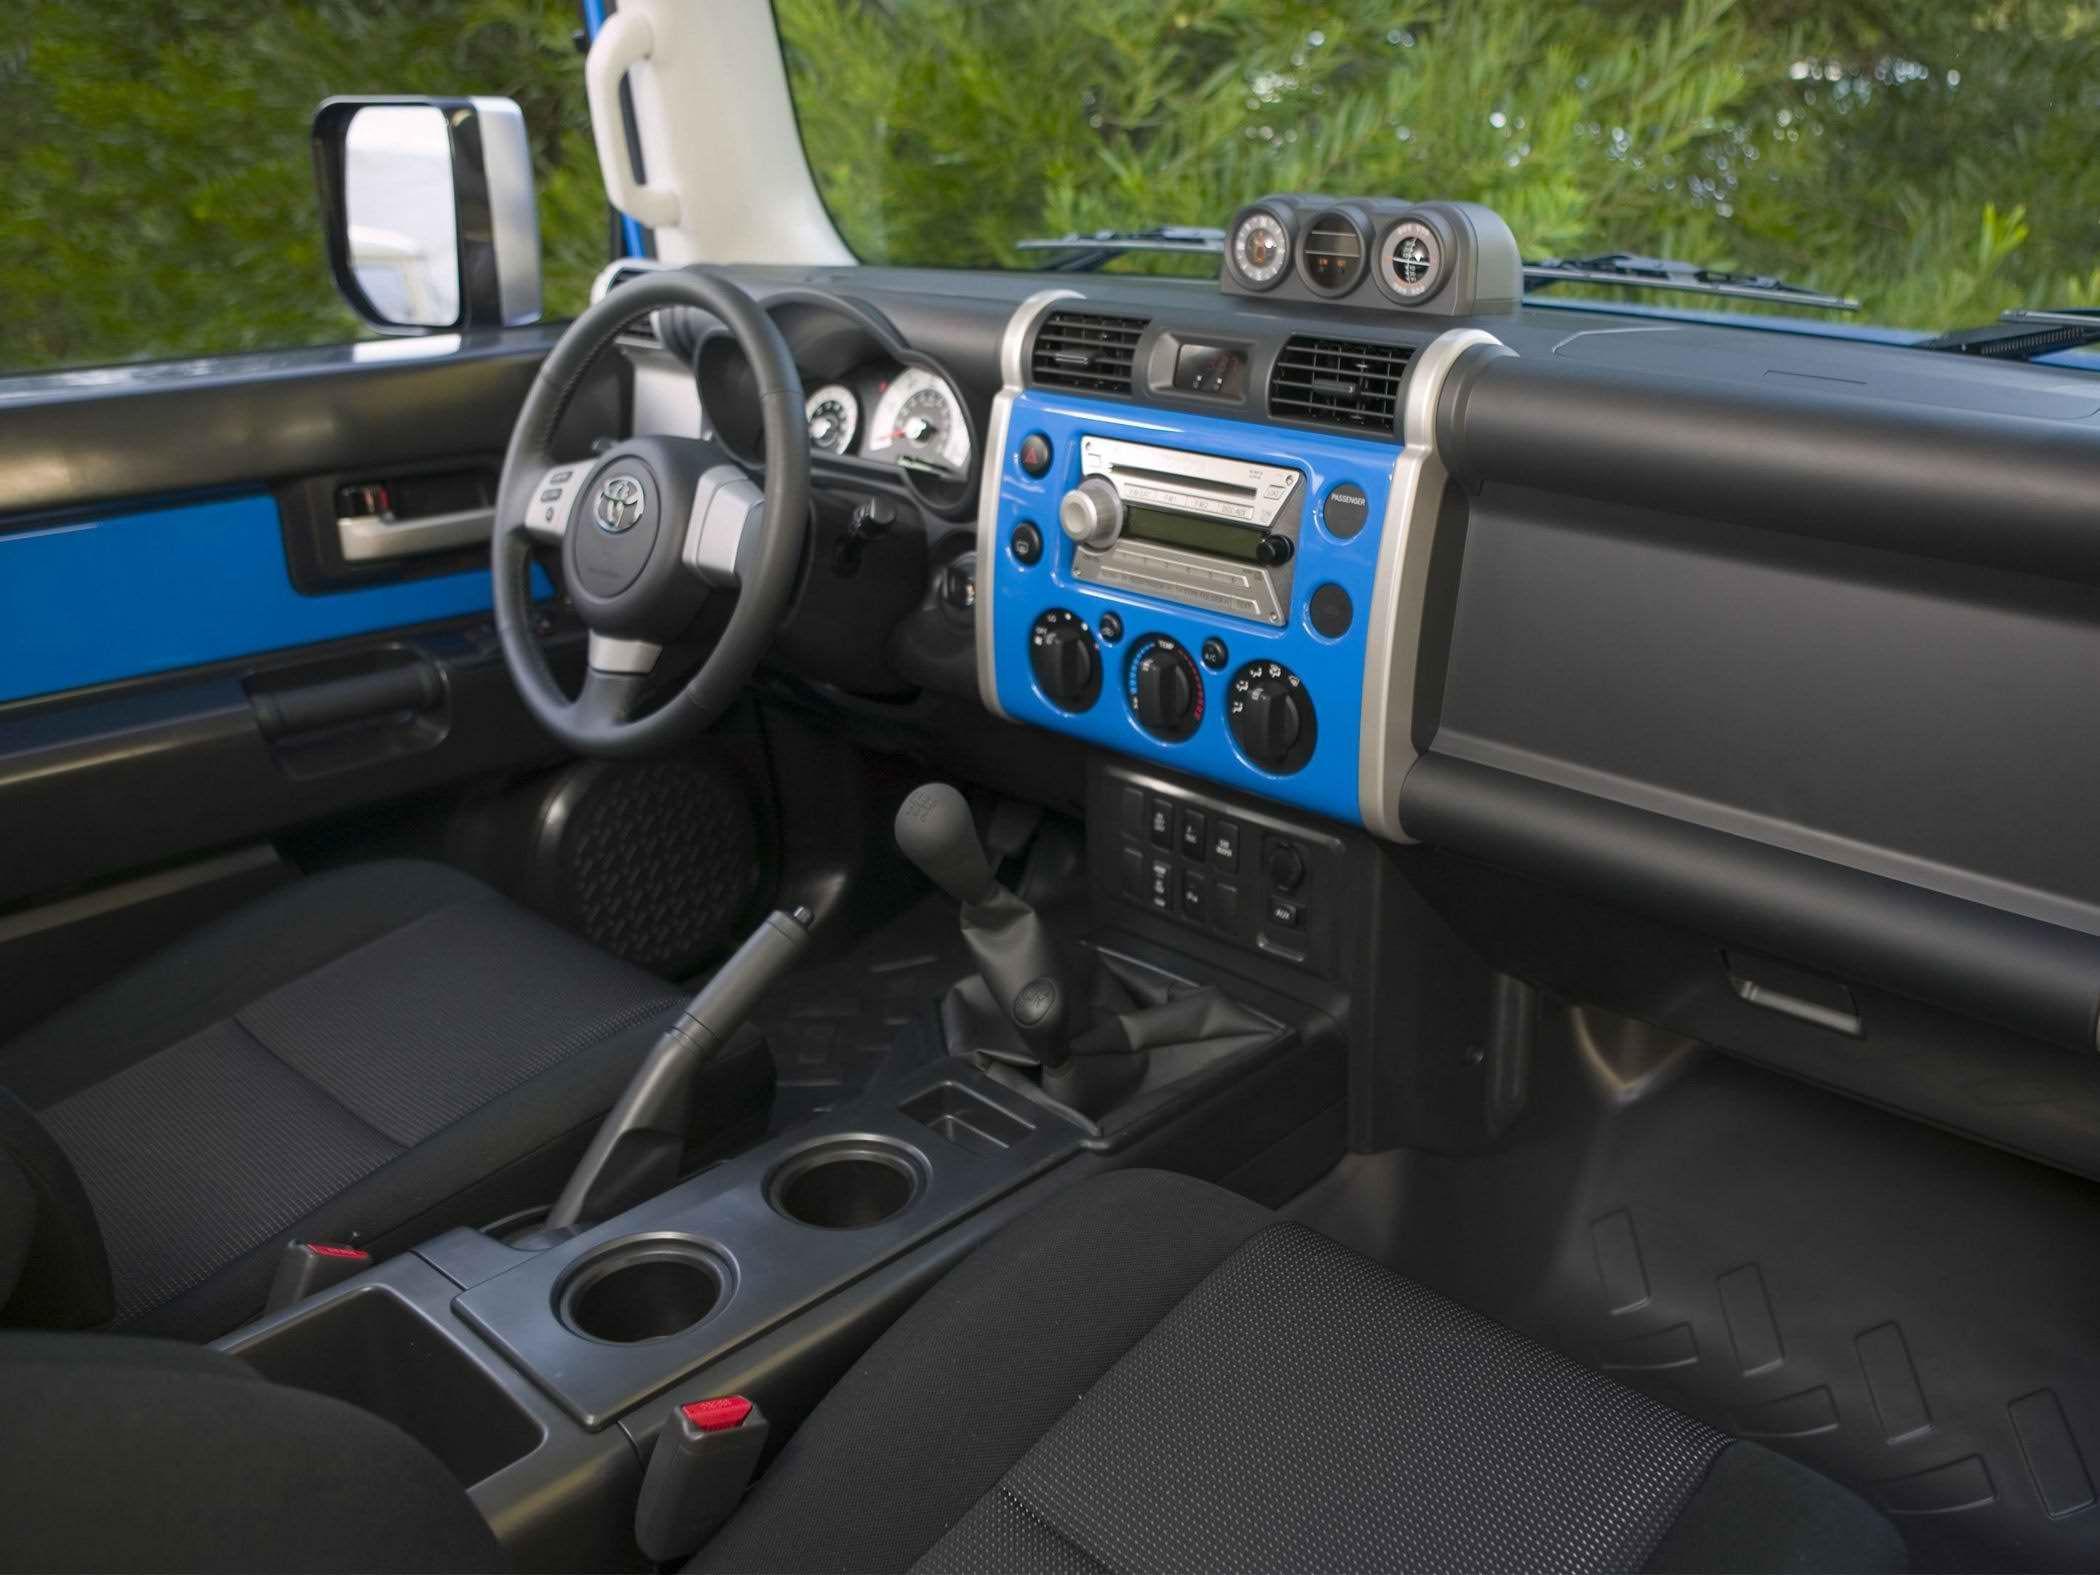 2017 Toyota FJ Cruiser interior Dashboard Toyota fj